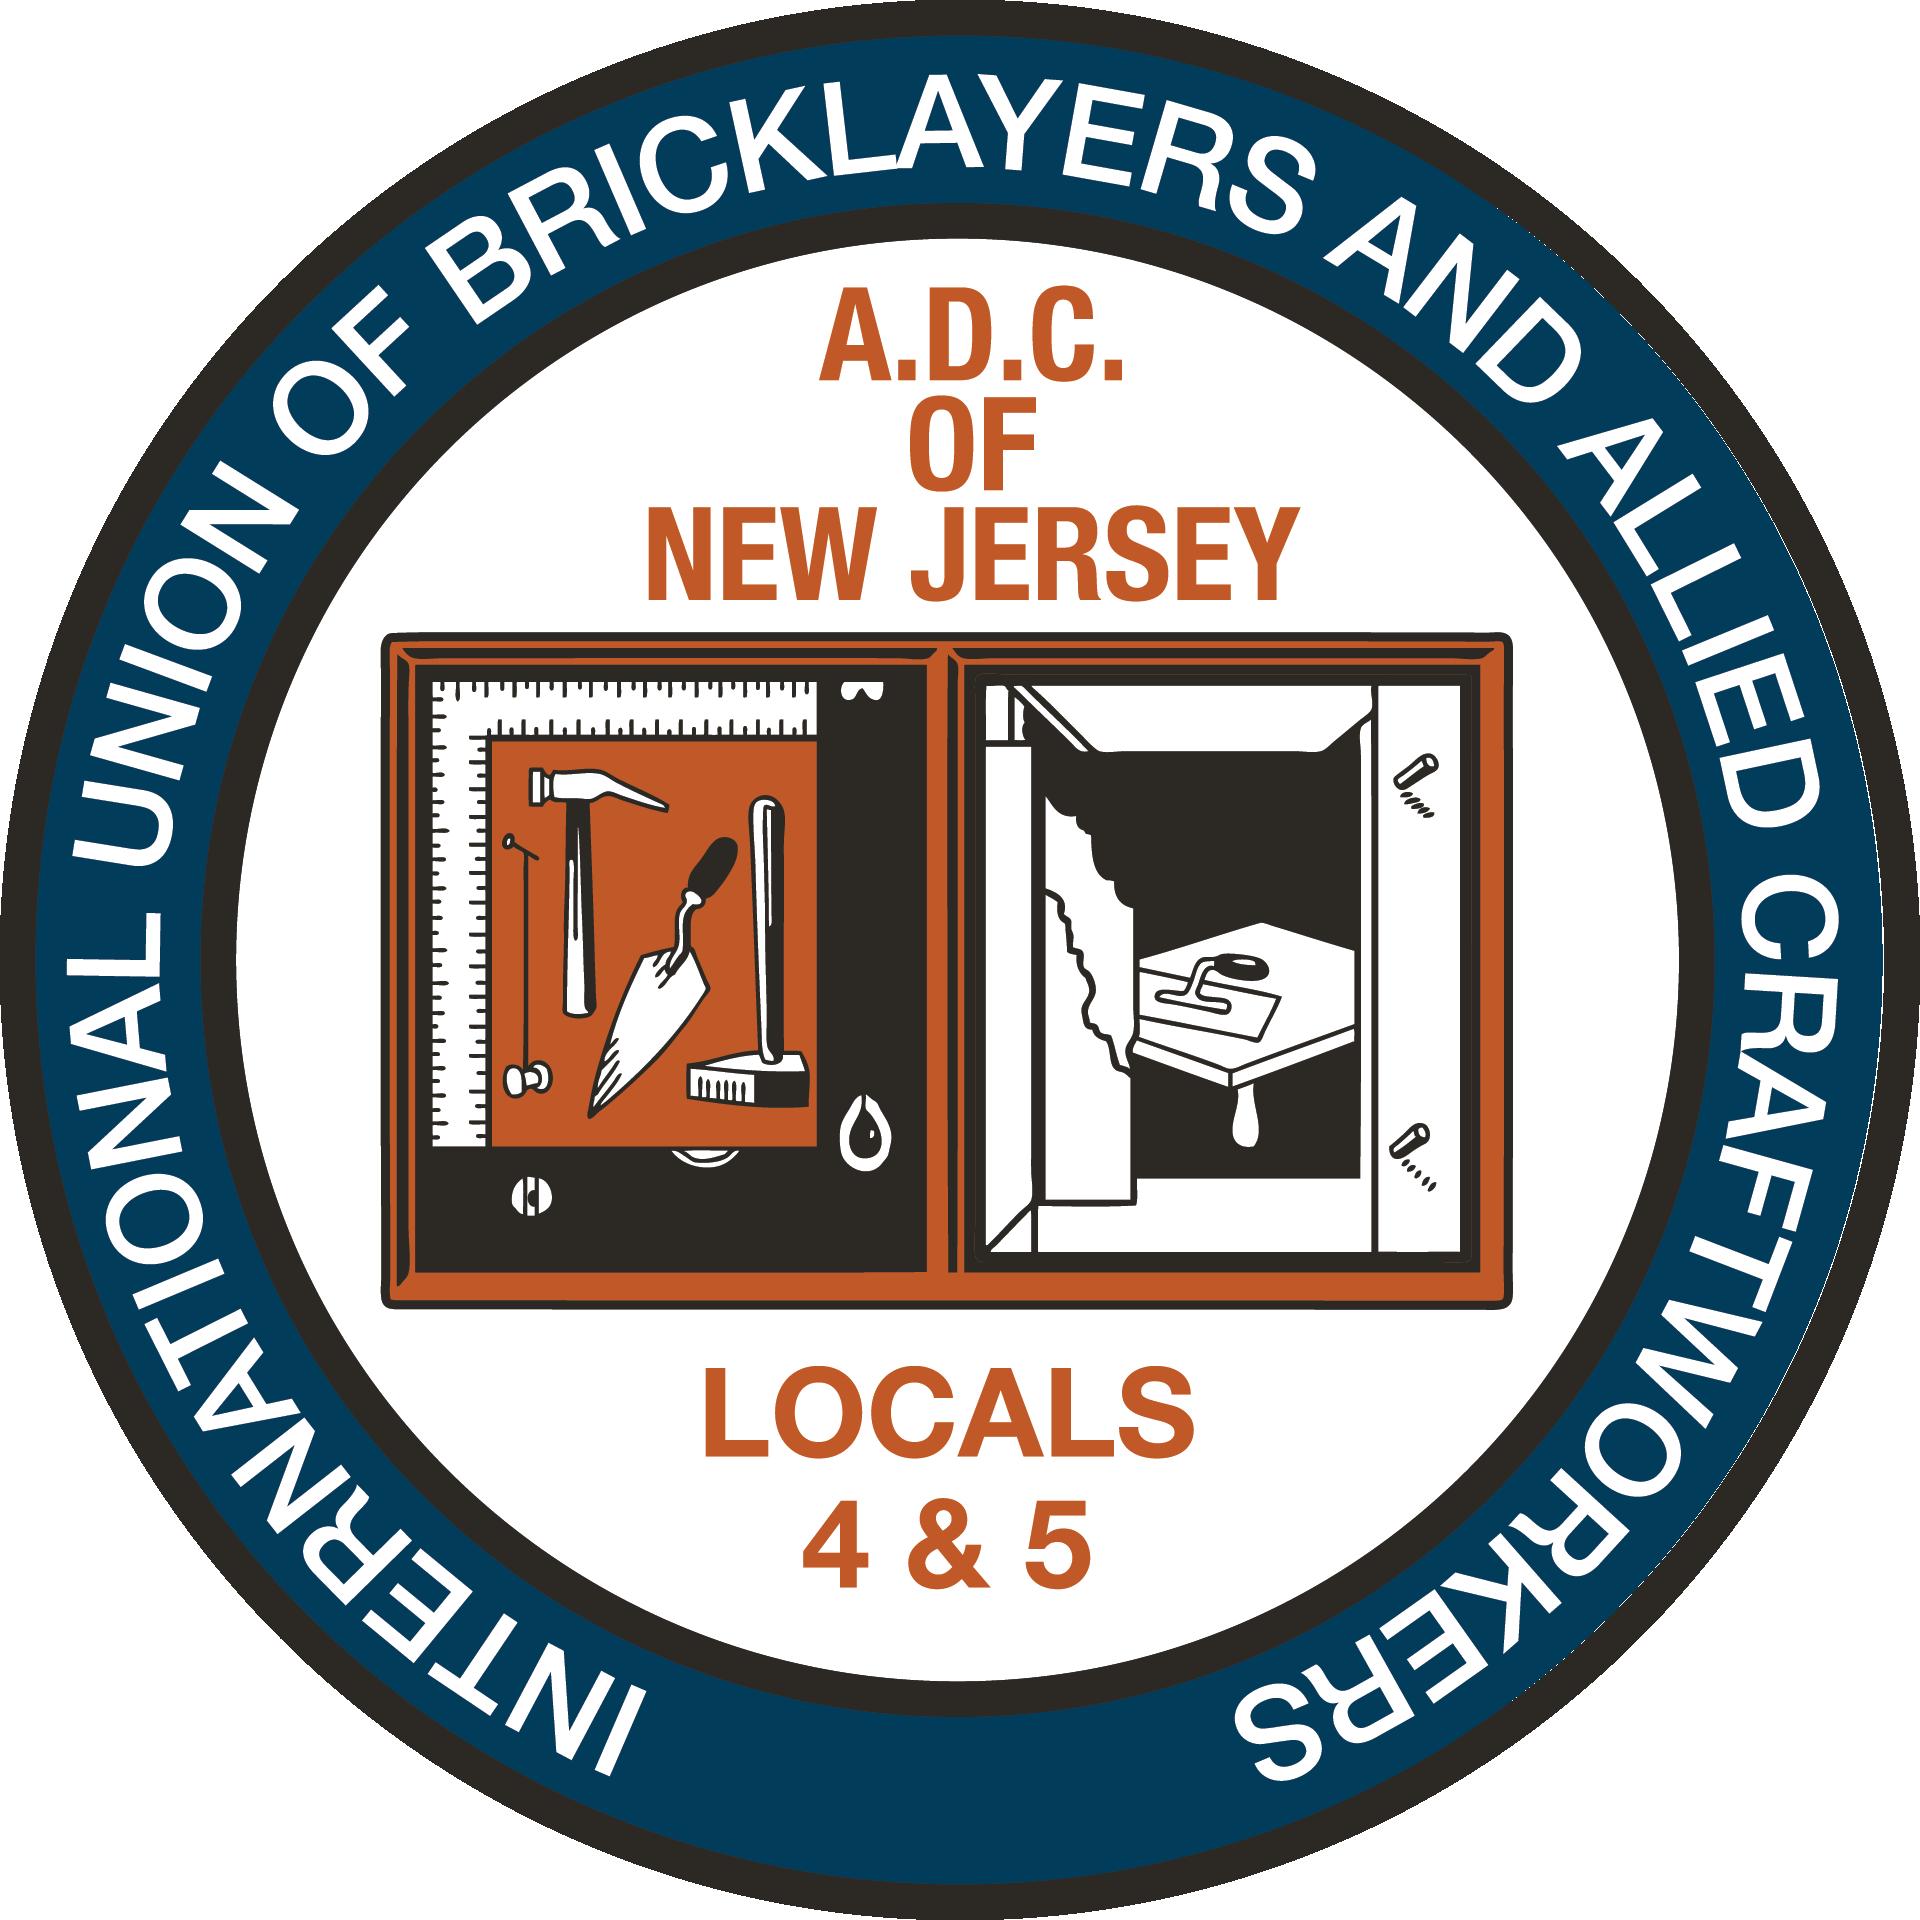 NJ AFL-CIO congratulates Union Brother Marty Walsh on his confirmation as Labor secretary